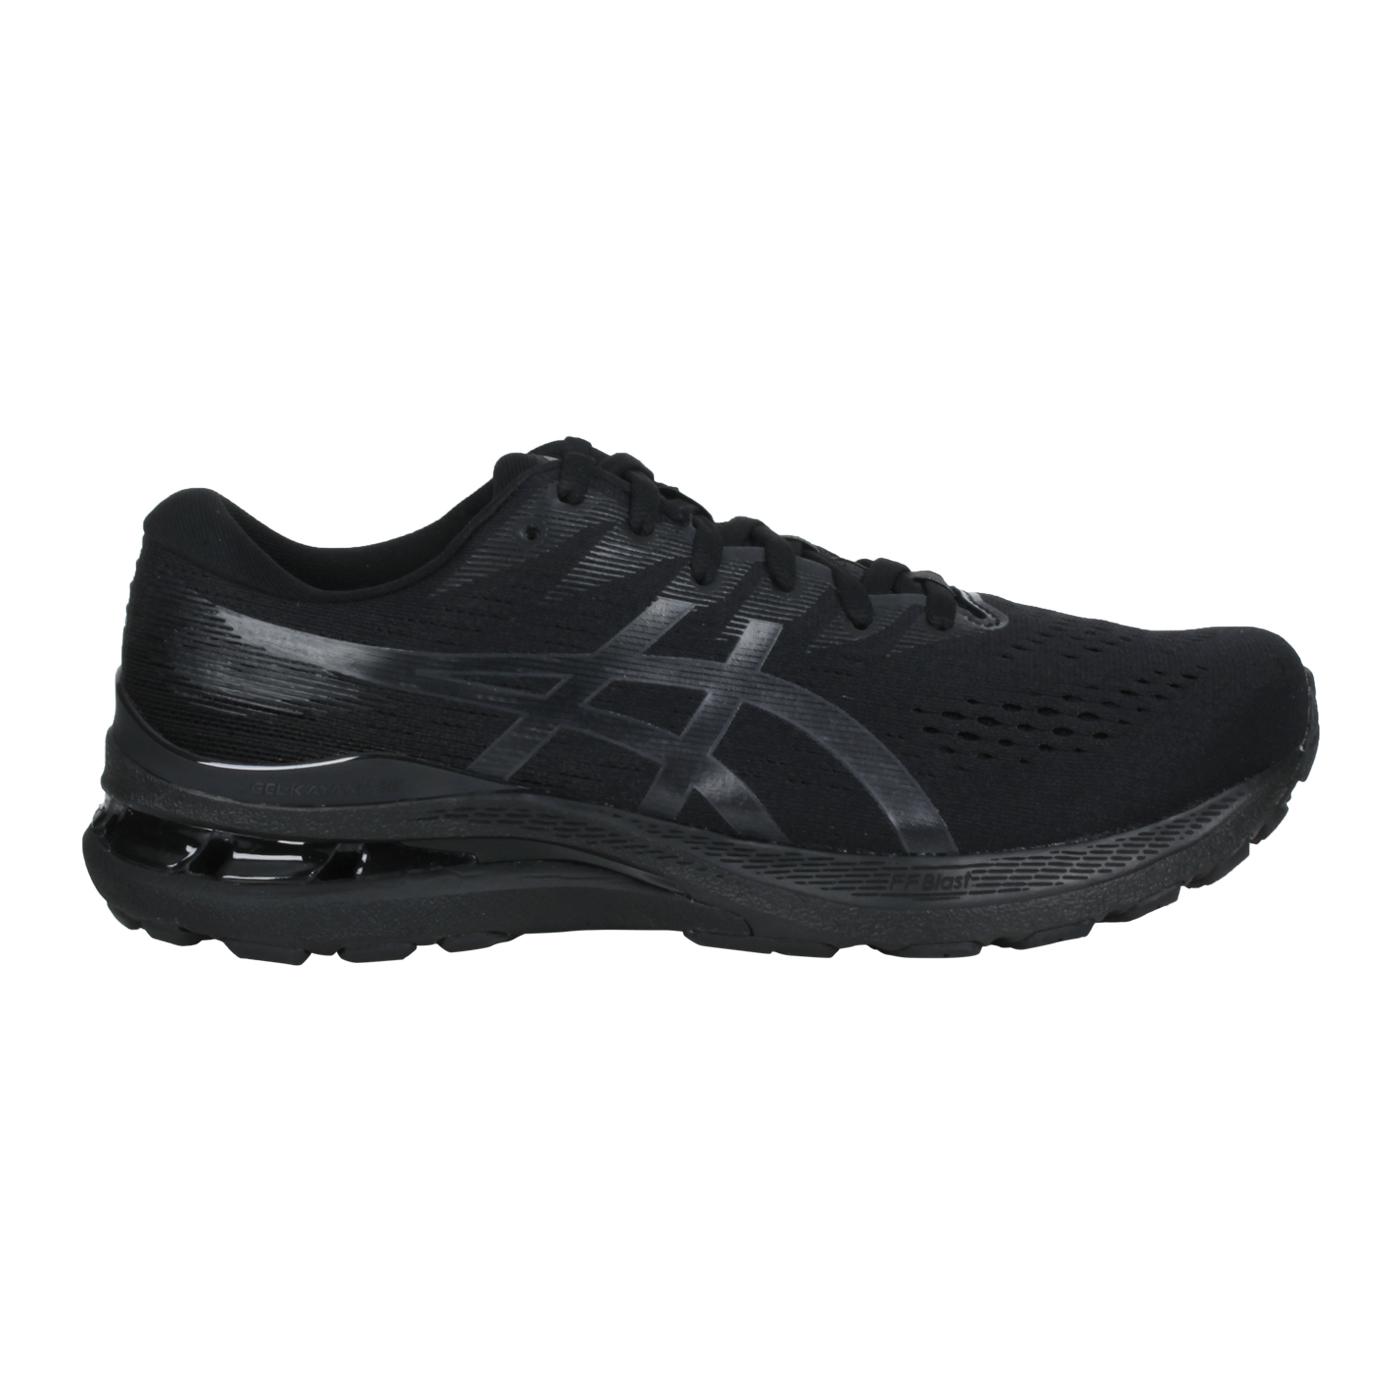 ASICS 男款慢跑鞋-4E  @GEL-KAYANO 28@1011B191-001 - 黑